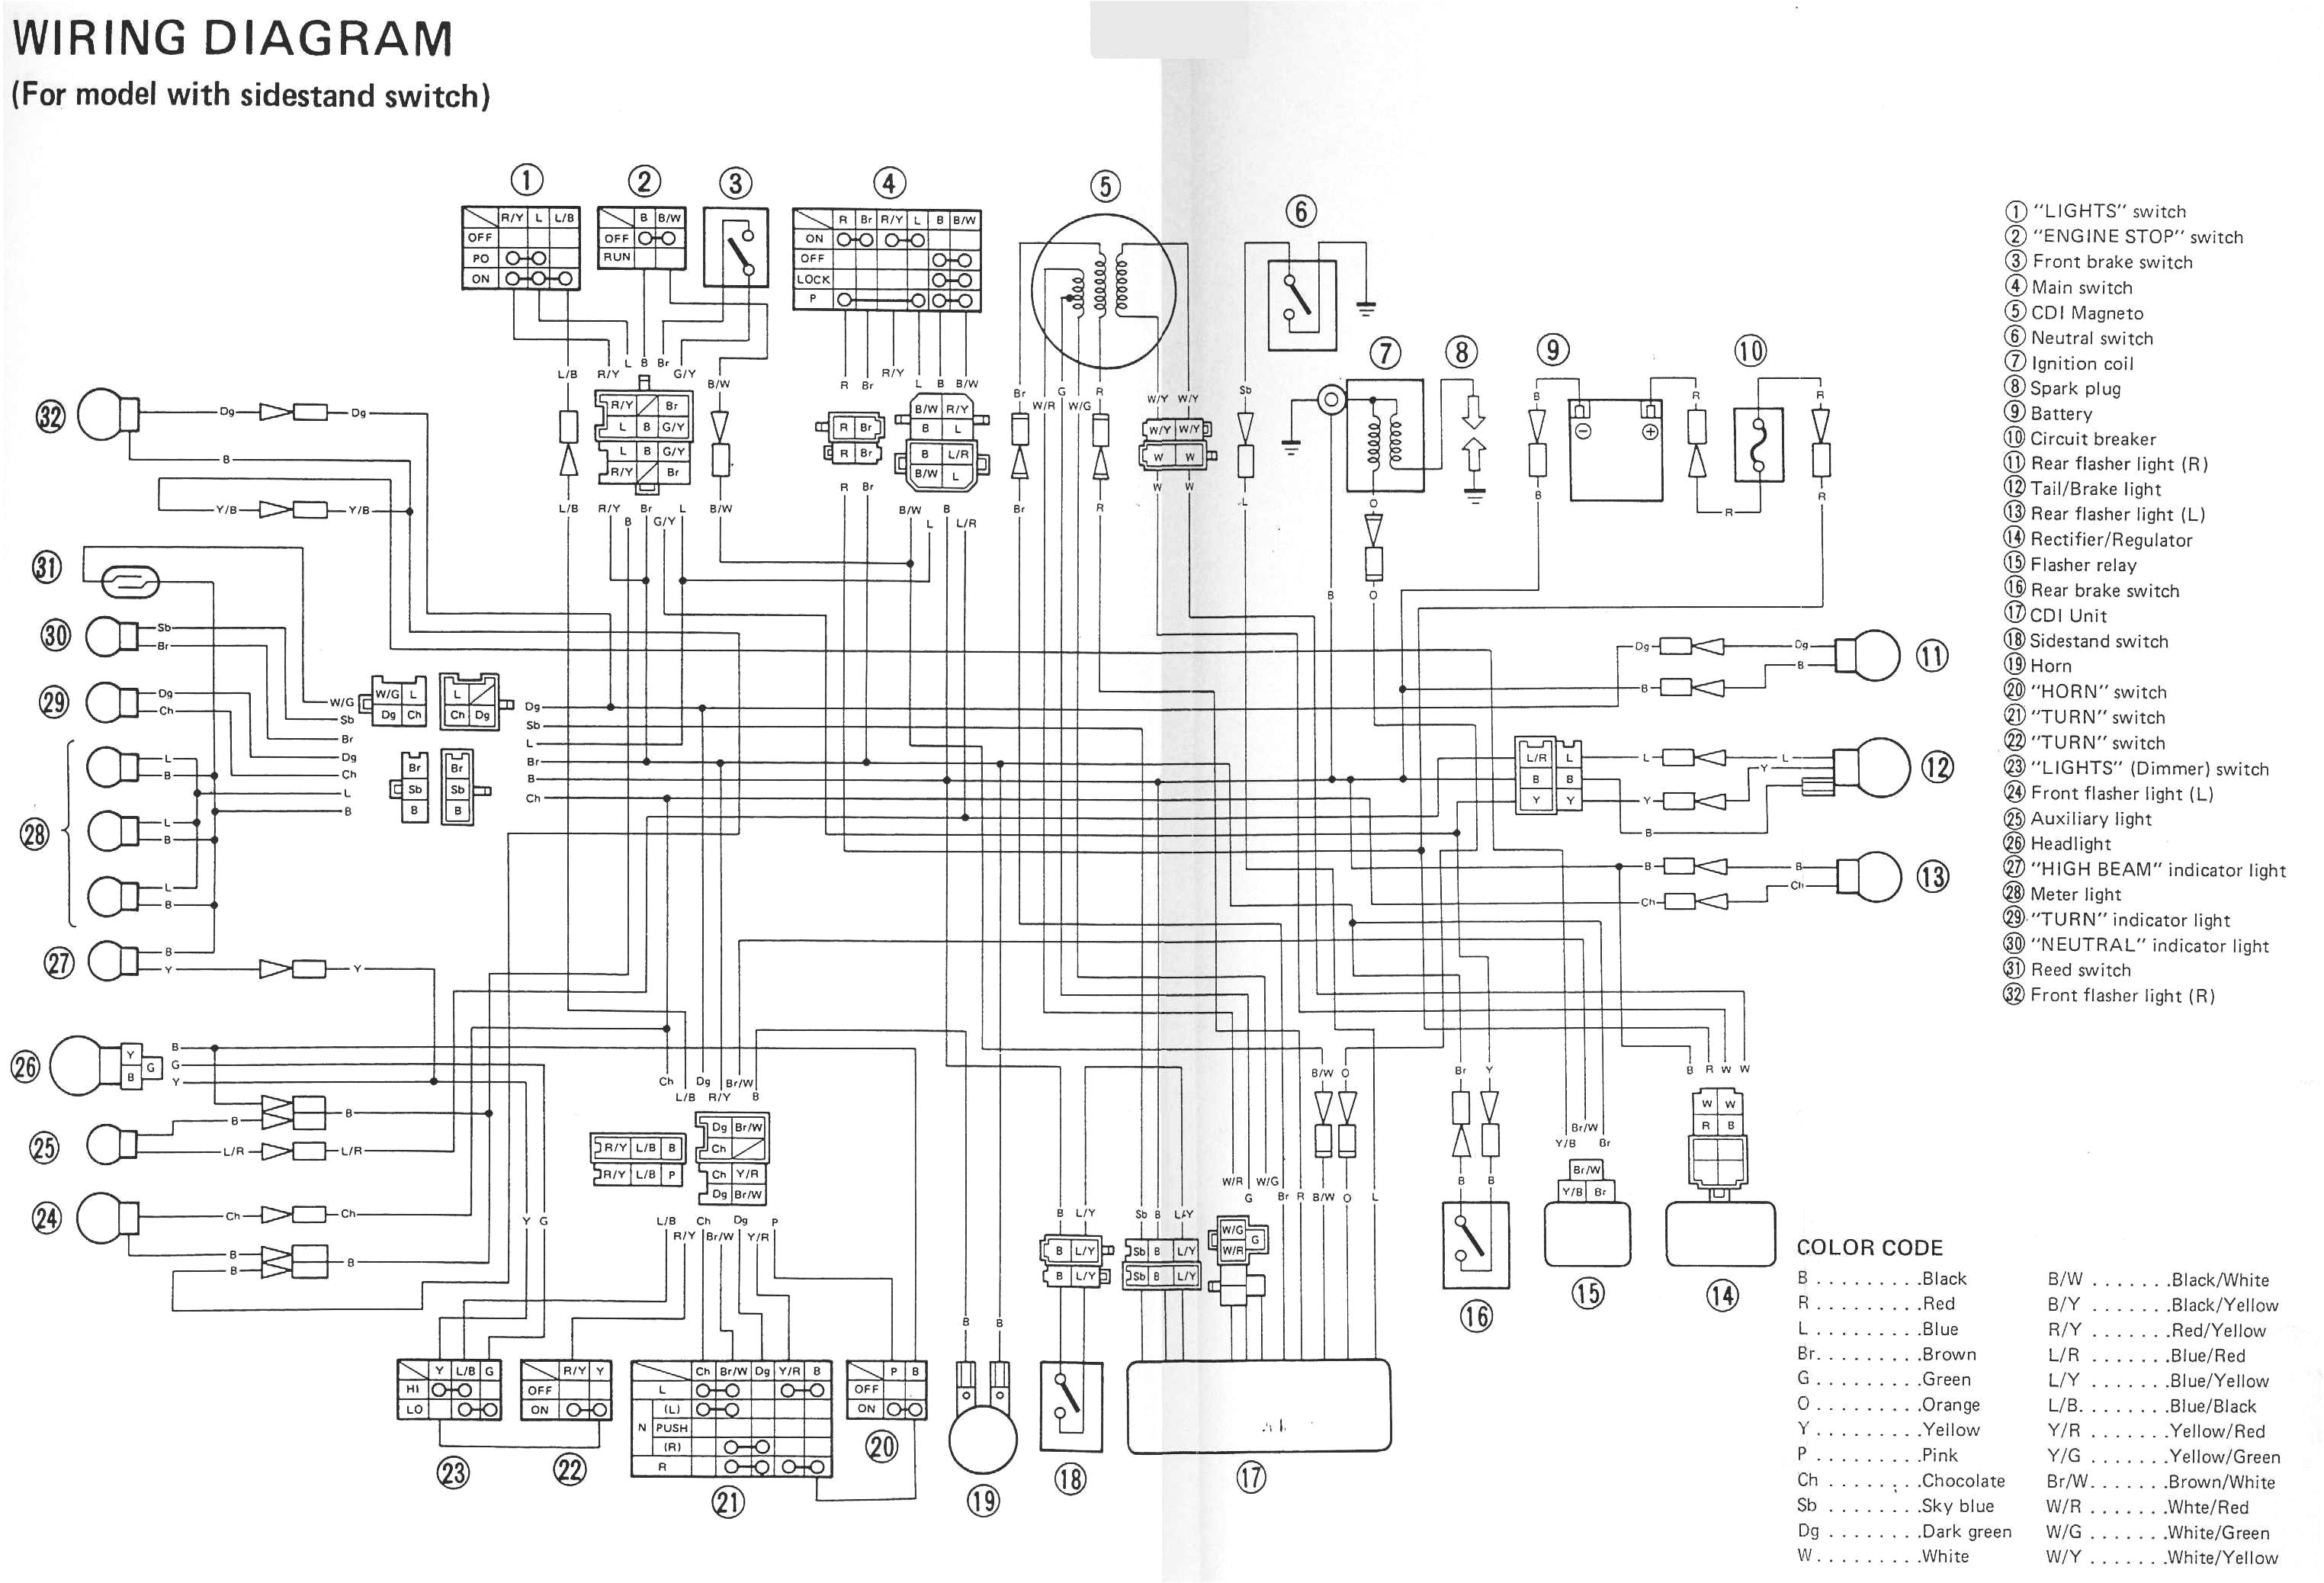 yamaha gp1200 fuse box wiring diagram note yamaha fuse box diagram yamaha fuse box diagram